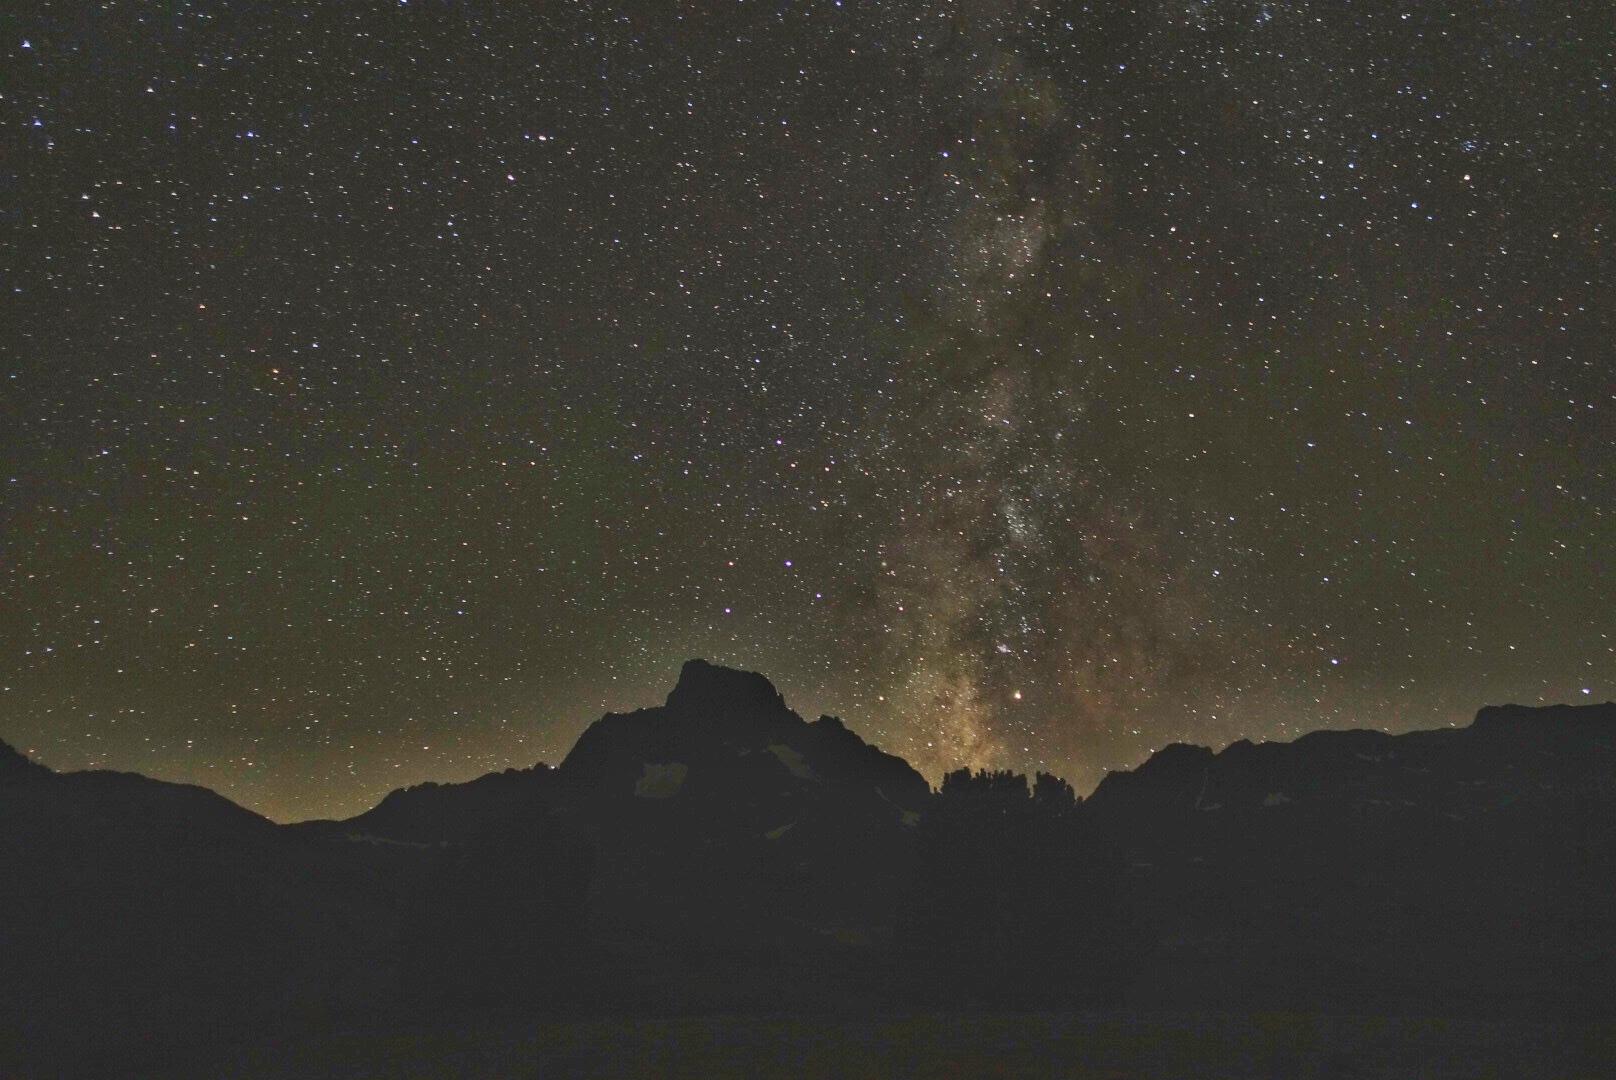 The Milky Way erupting like the Vegas strip above Banner Peak.